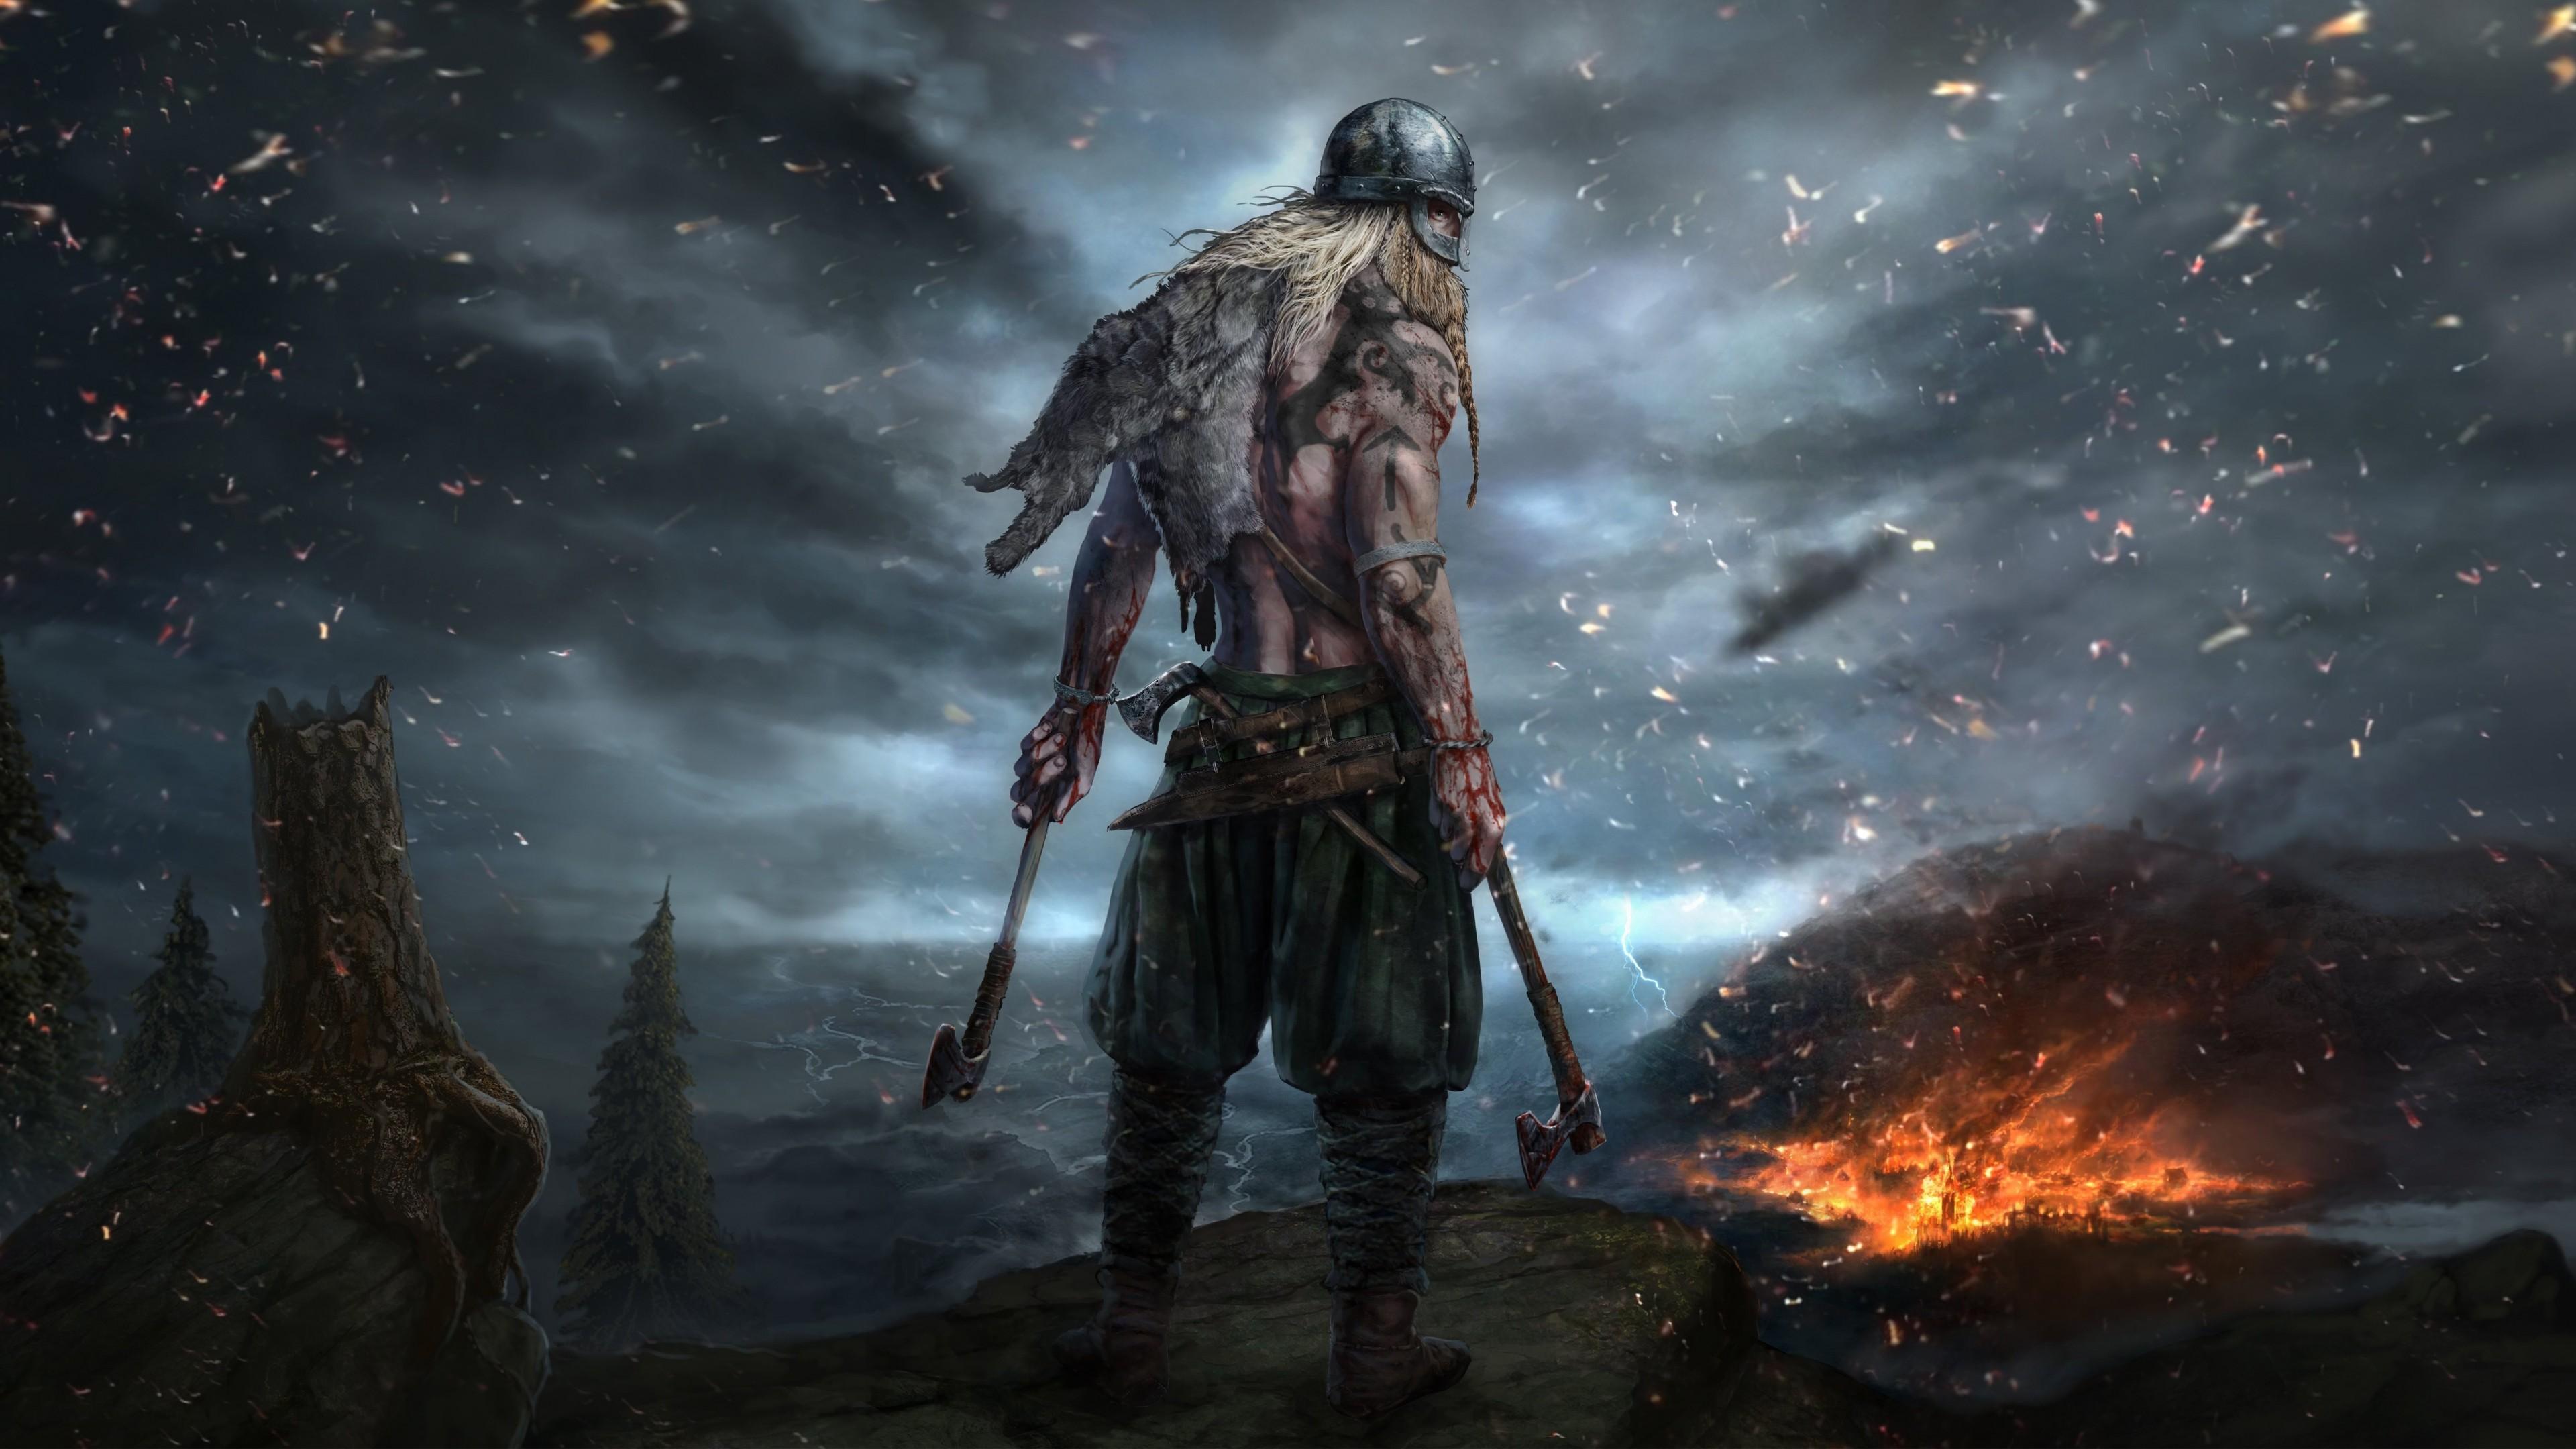 Mortal Kombat X Wallpapers Hd Iphone Ancestors Game 2017 4k 5k Wallpapers Hd Wallpapers Id